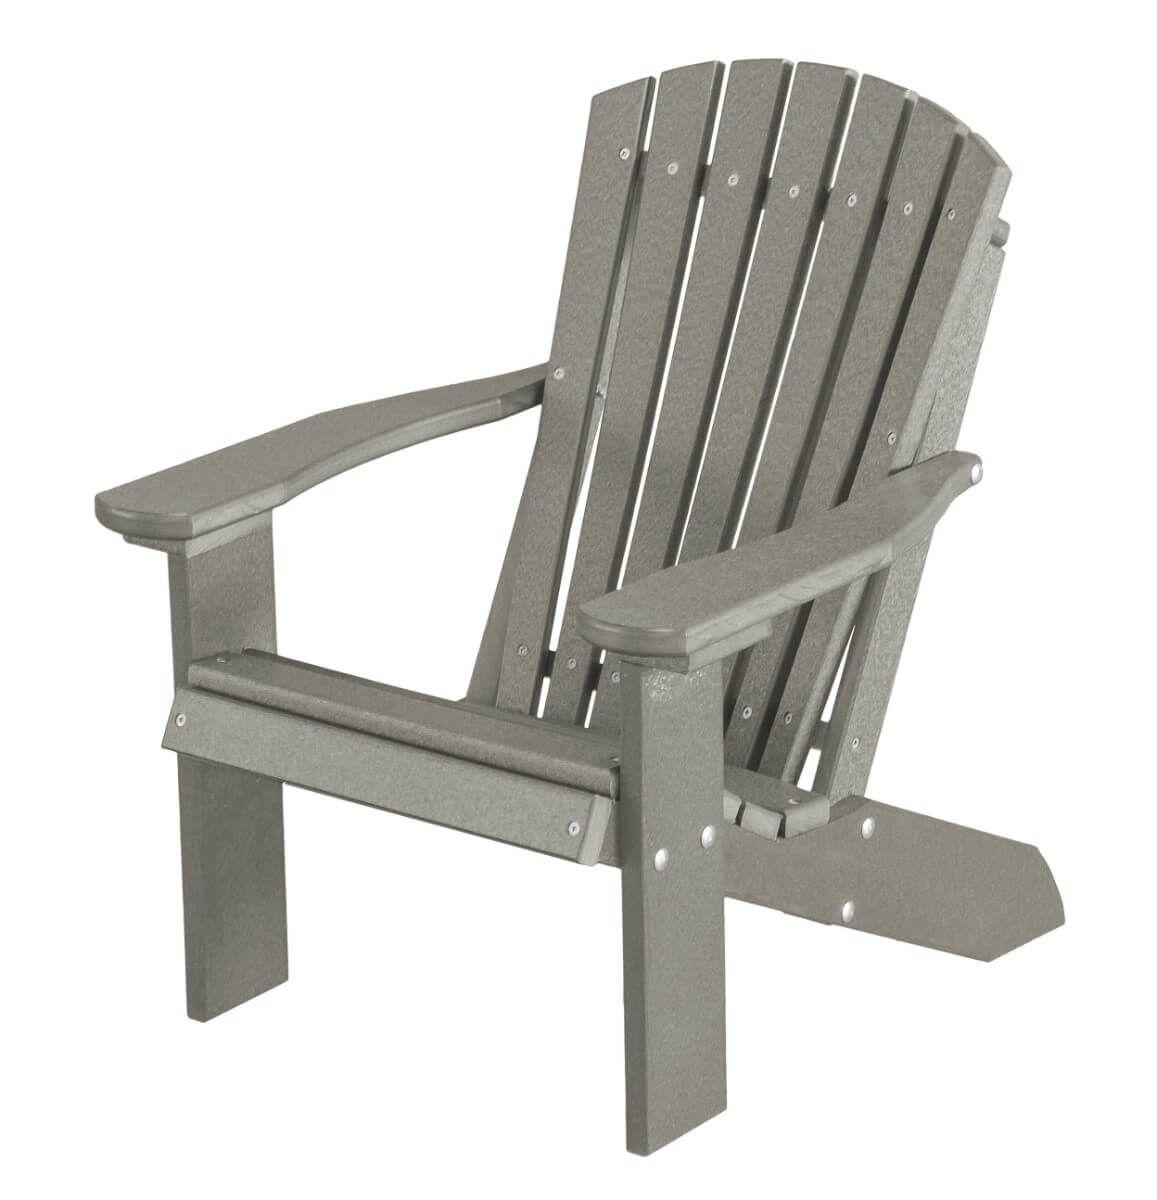 Light Gray Sidra Child's Adirondack Chair